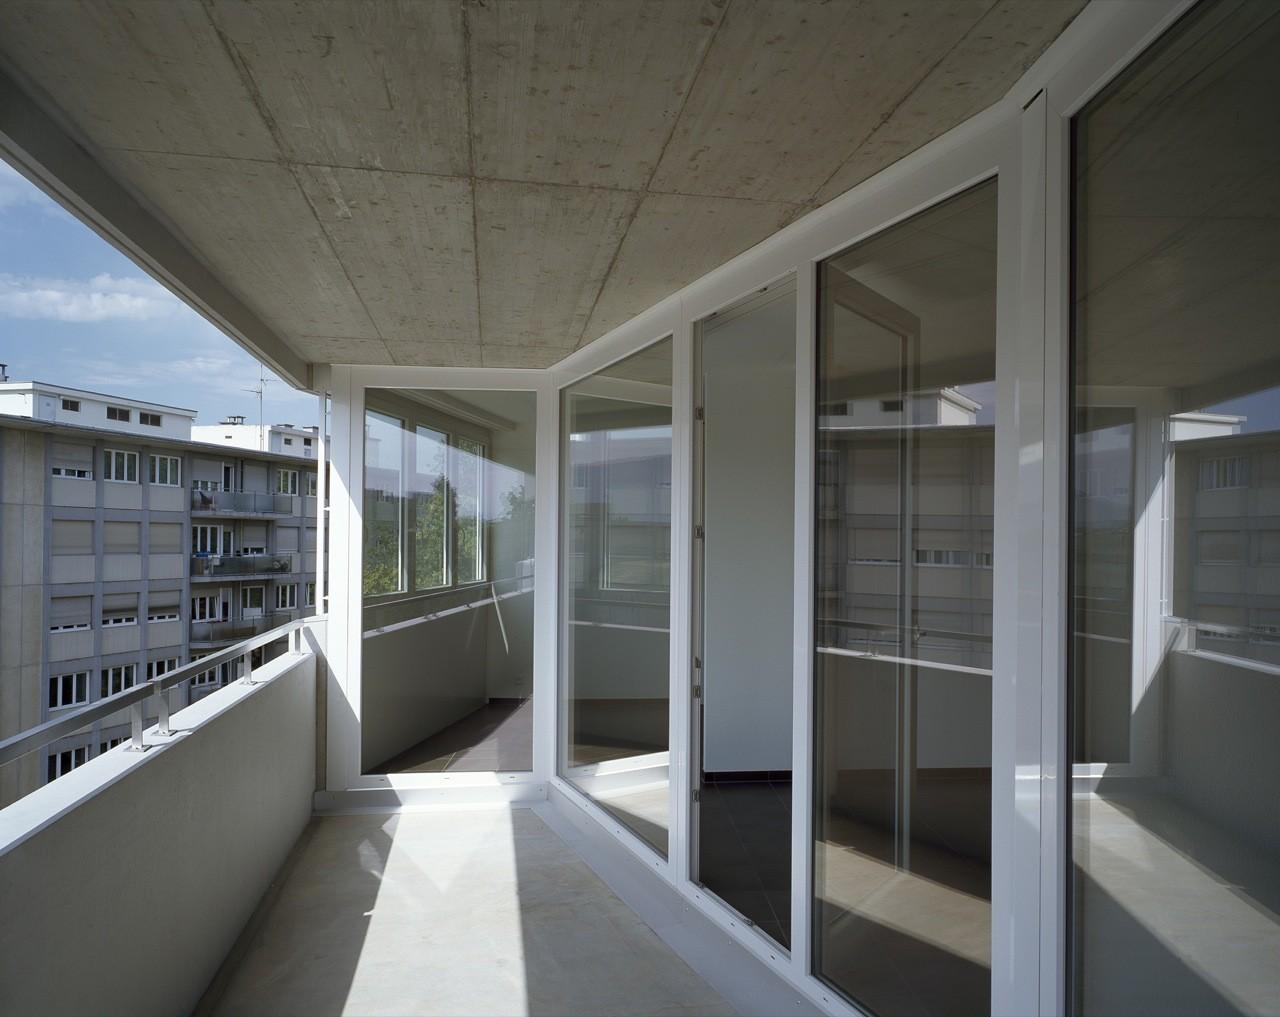 120 affordable appartments / meier + associés architectes  + Burckhardt Partner